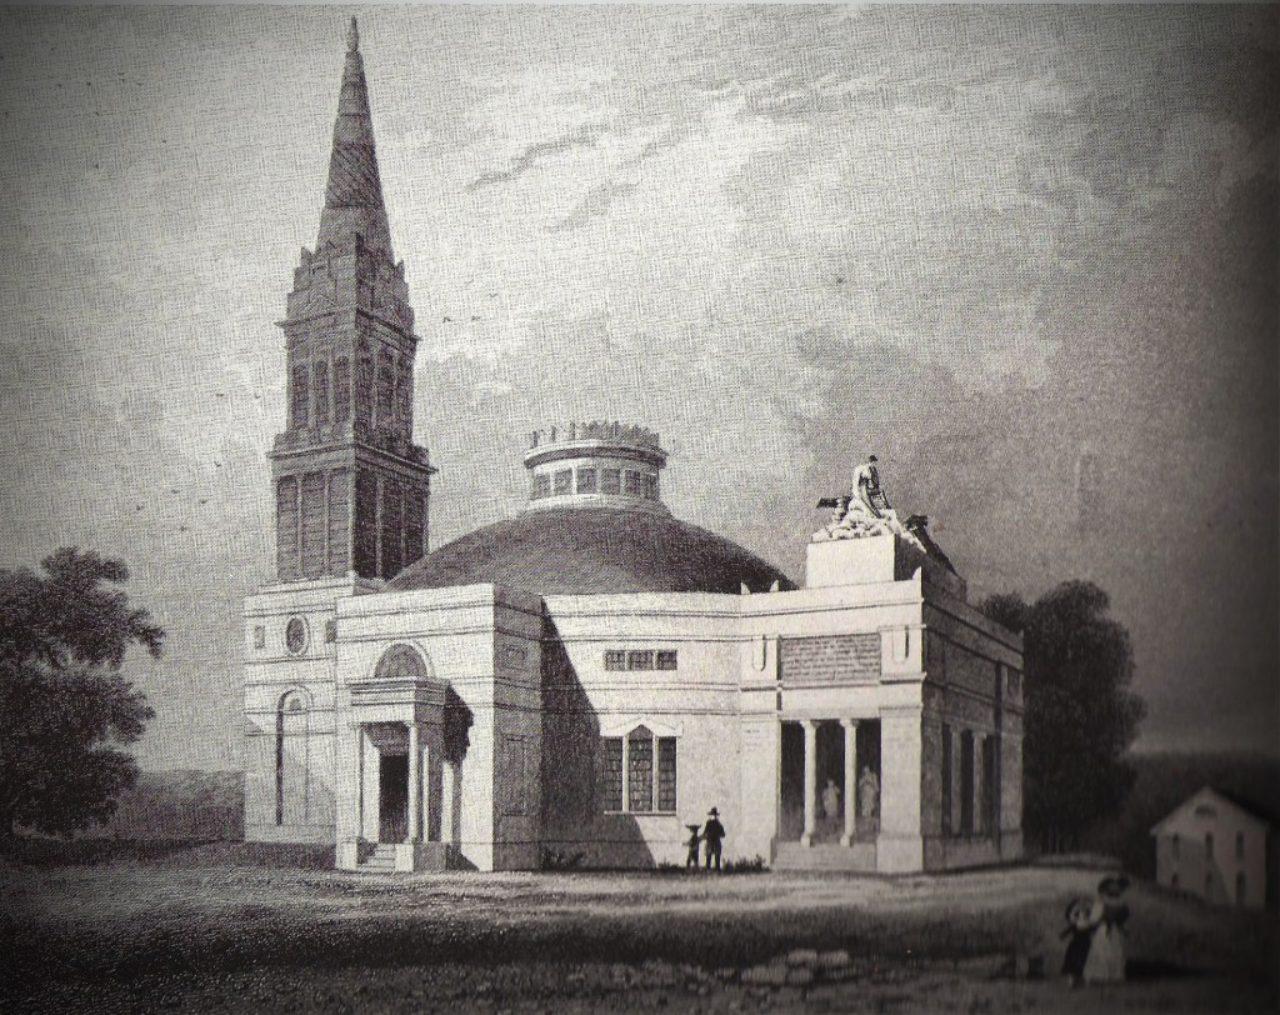 Monumental Church engraving